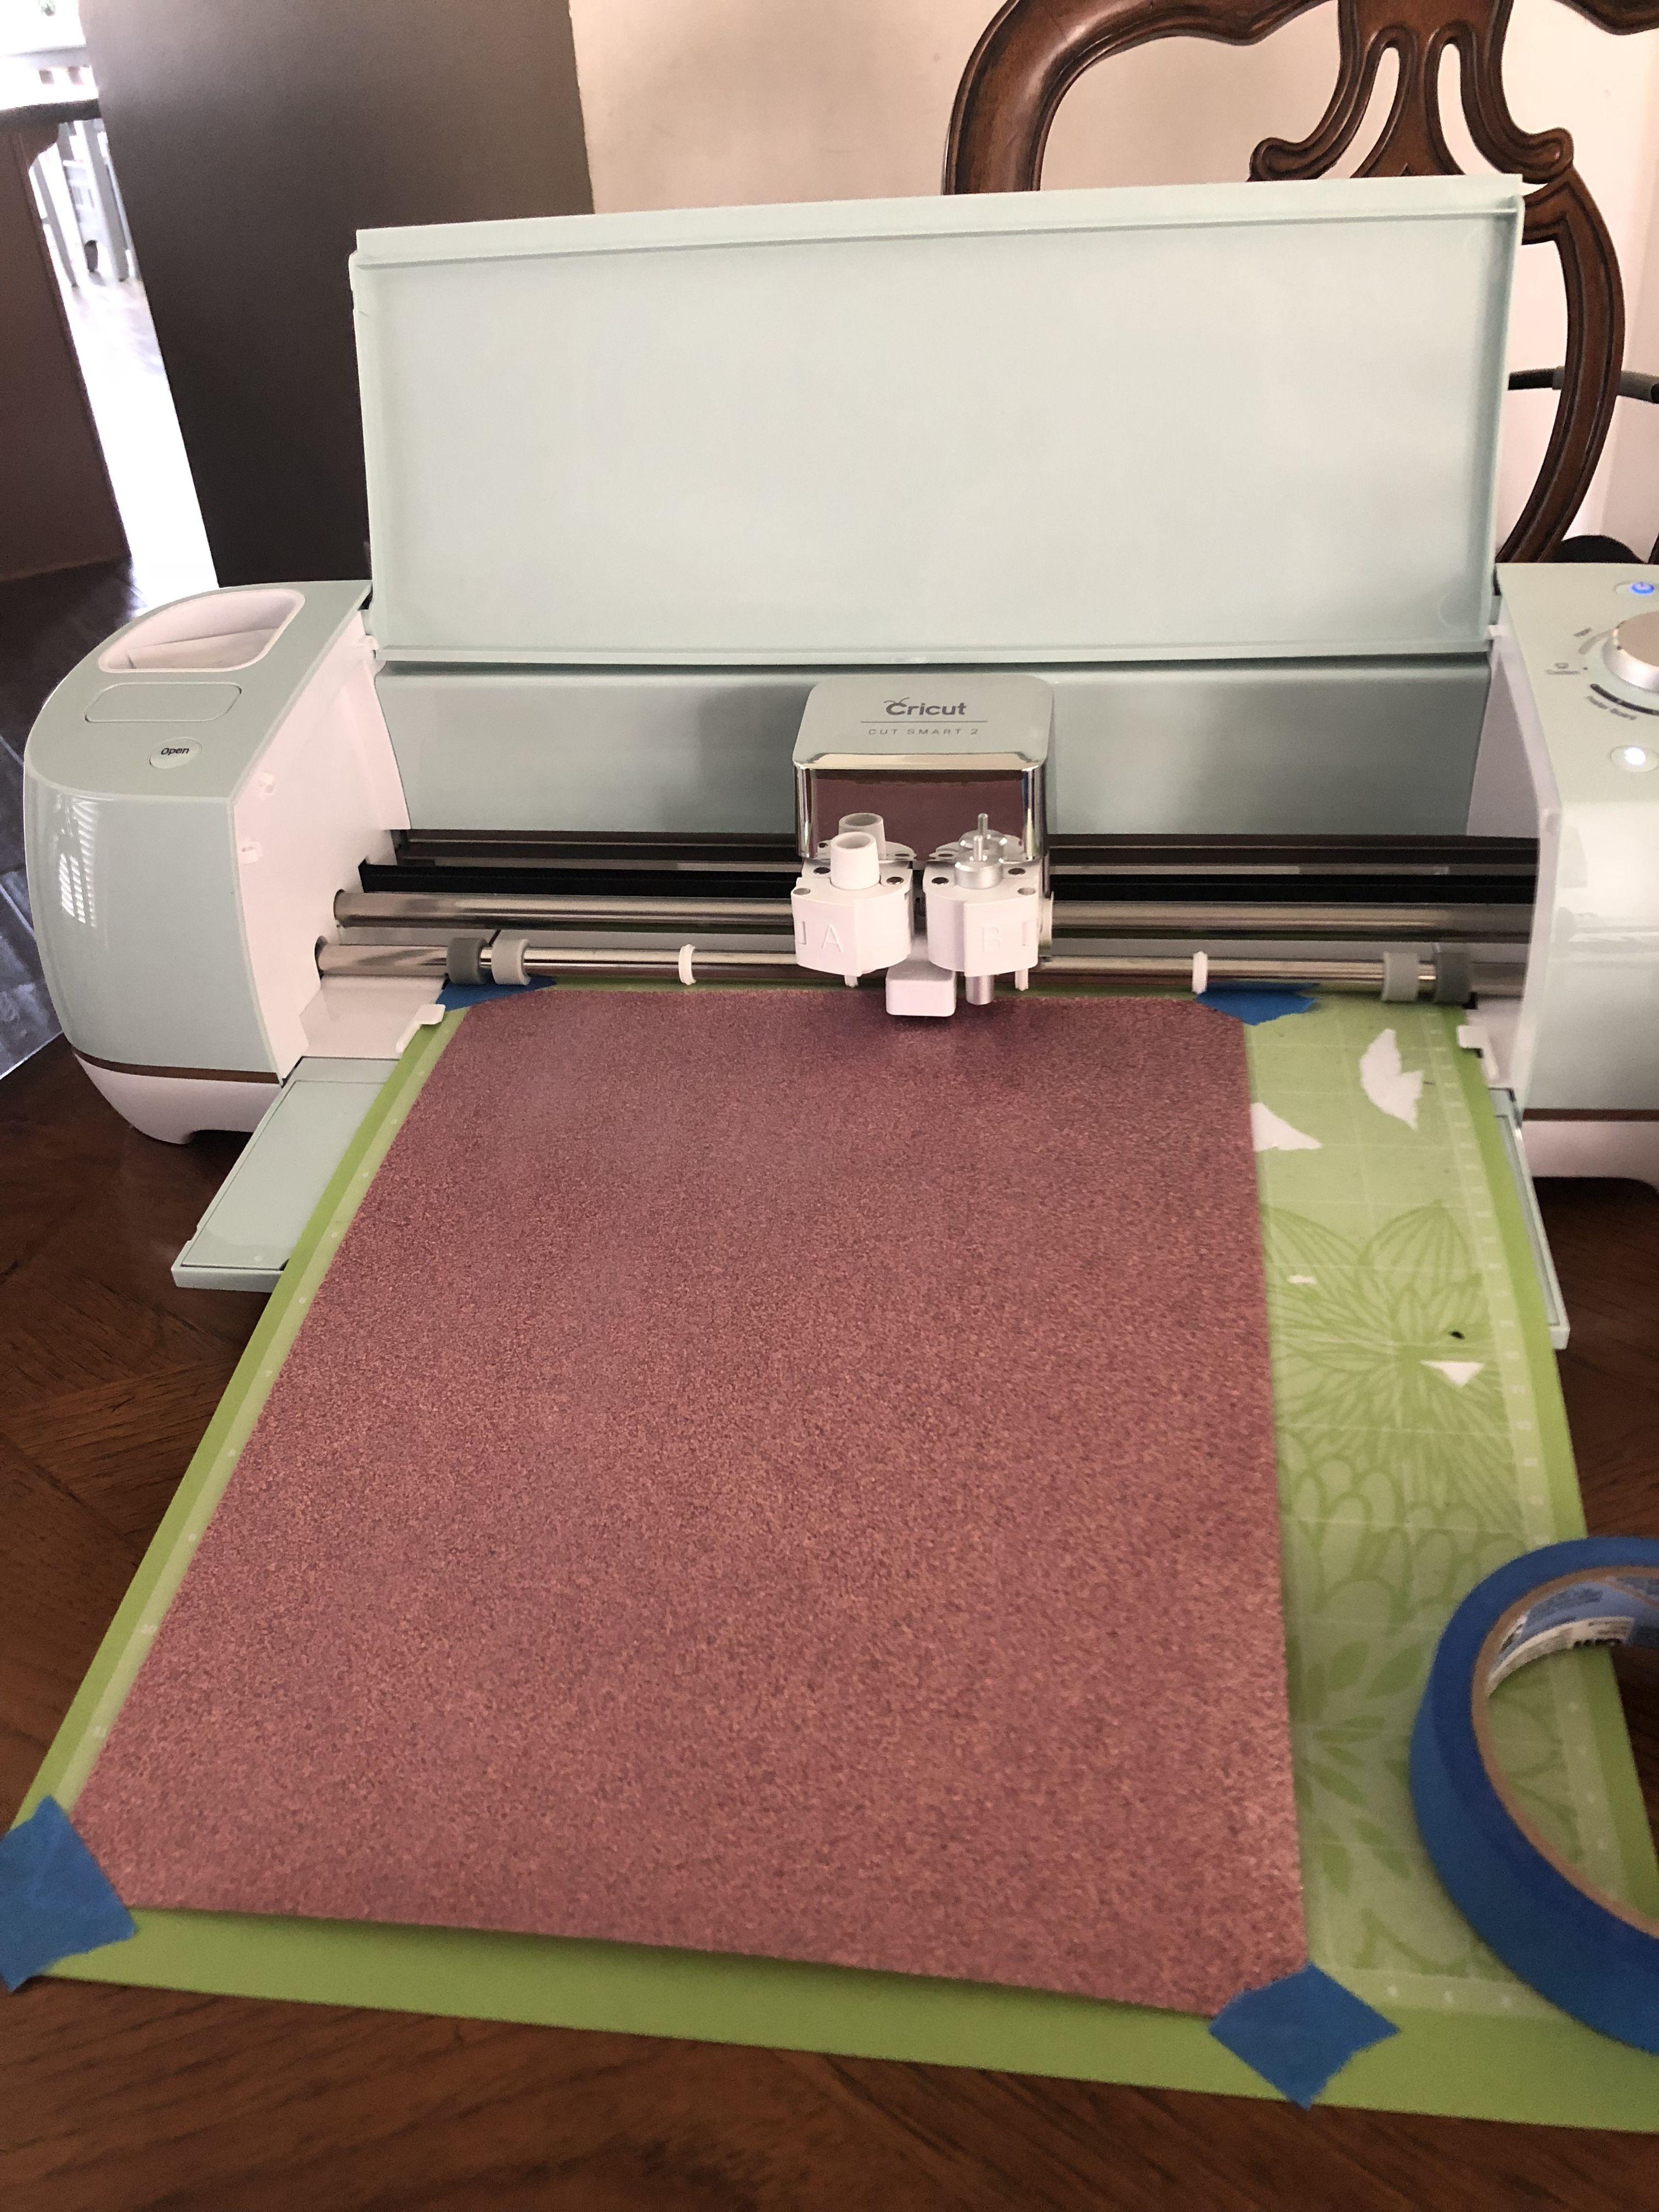 antimicrobial closeup runners mats corner mat tape webres and for adhesive backing urinal floor hygomat